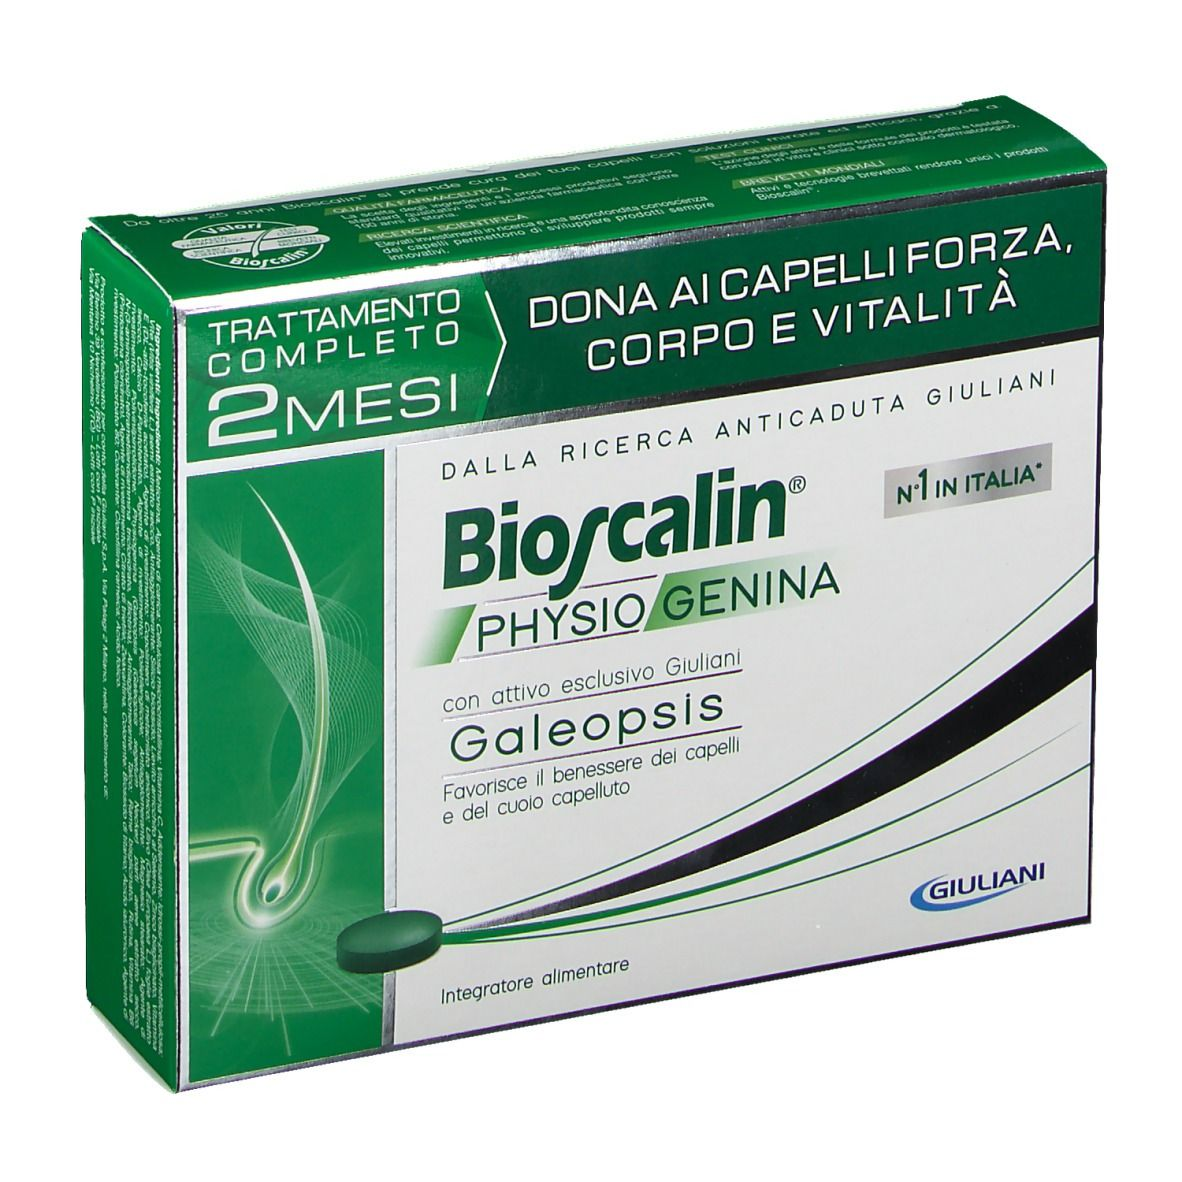 Bioscalin® Physiogenina Compresse Uomo e Donna 60 pz ...